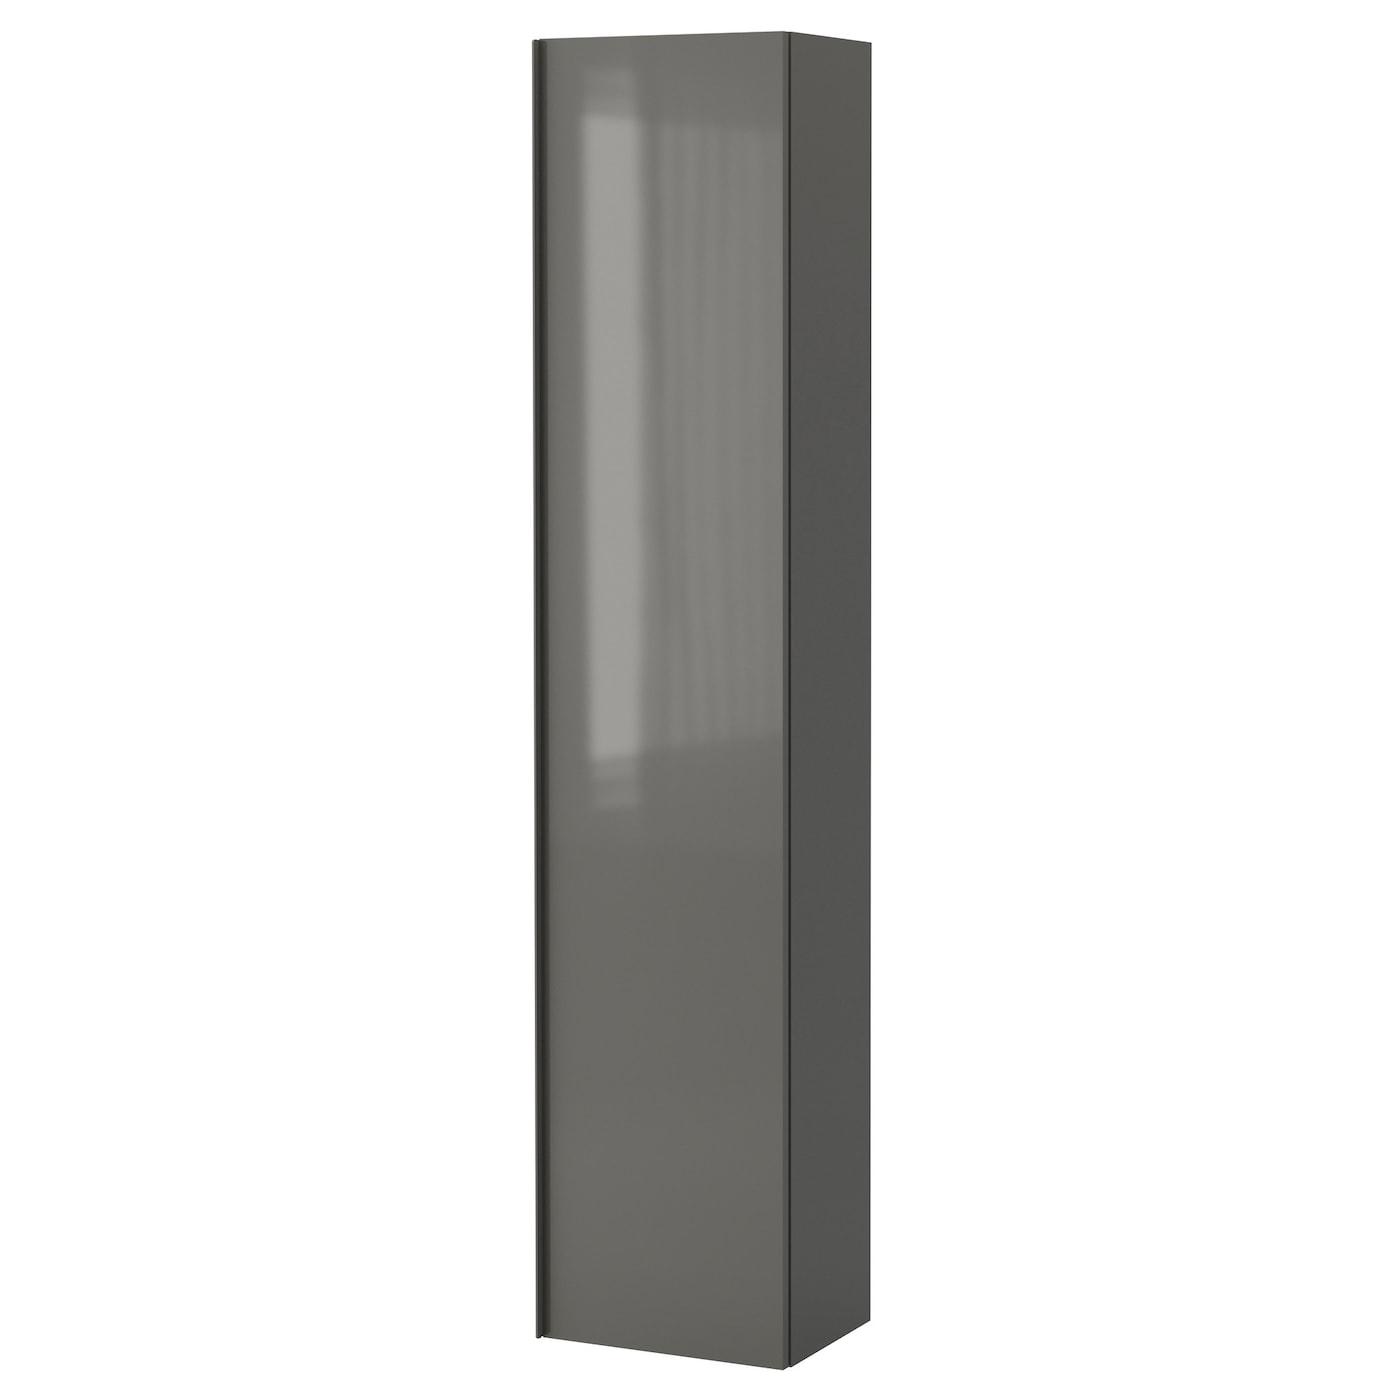 GODMORGON High cabinet High gloss grey 40x30x192 cm   IKEA